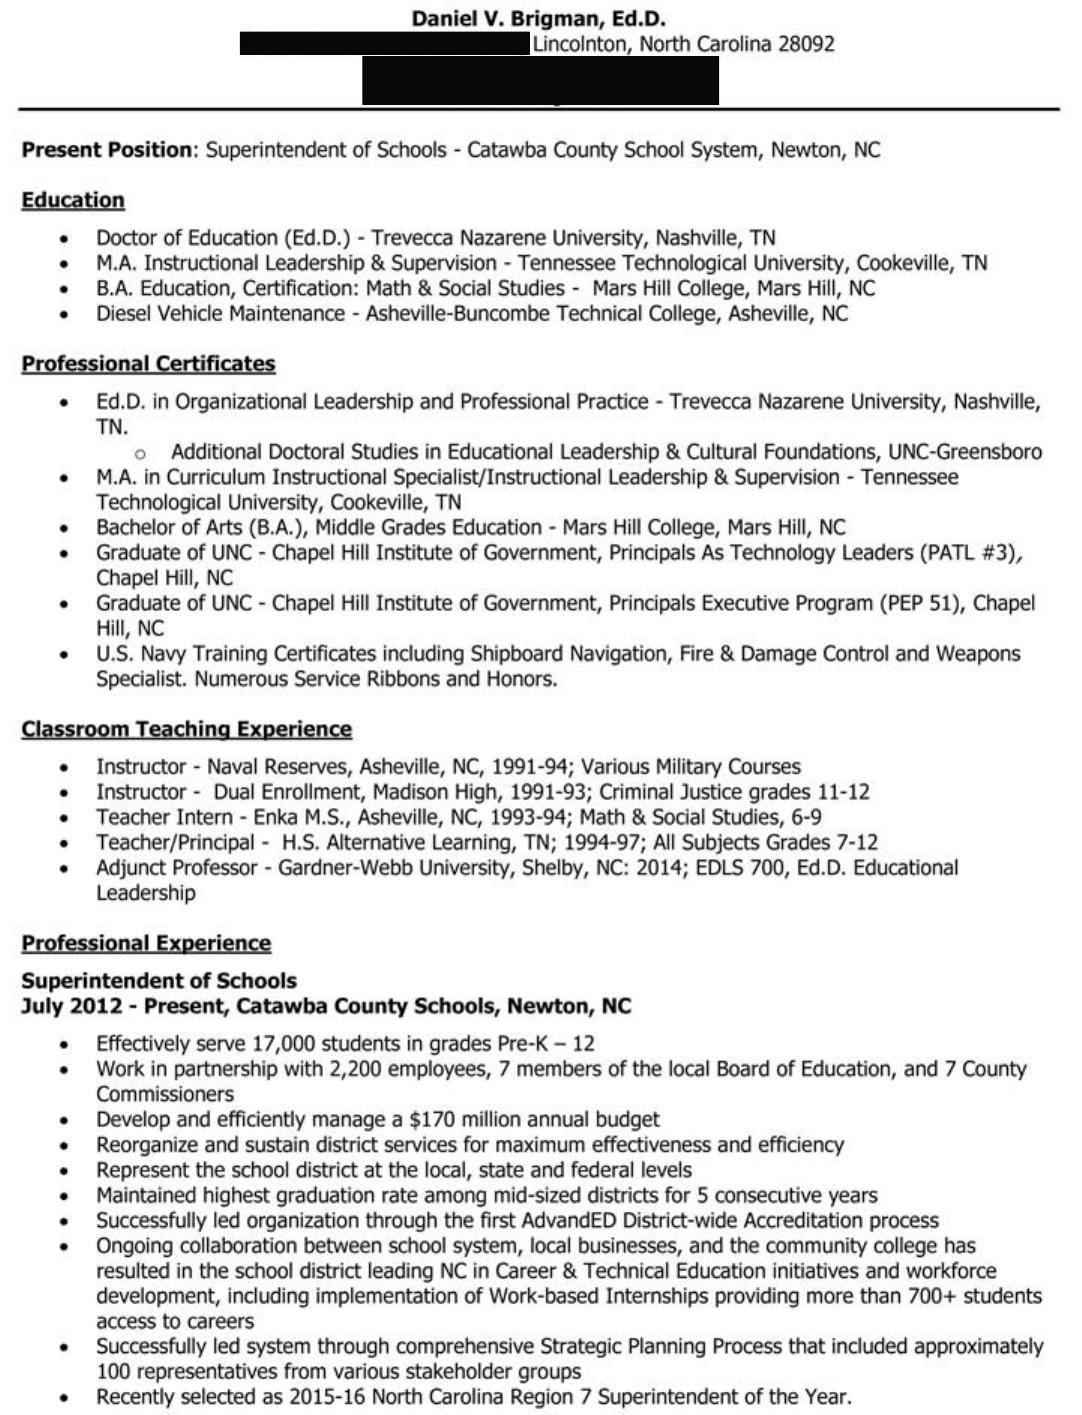 Daniel brigman resume decaturdaily download pdf daniel brigman resume xflitez Image collections